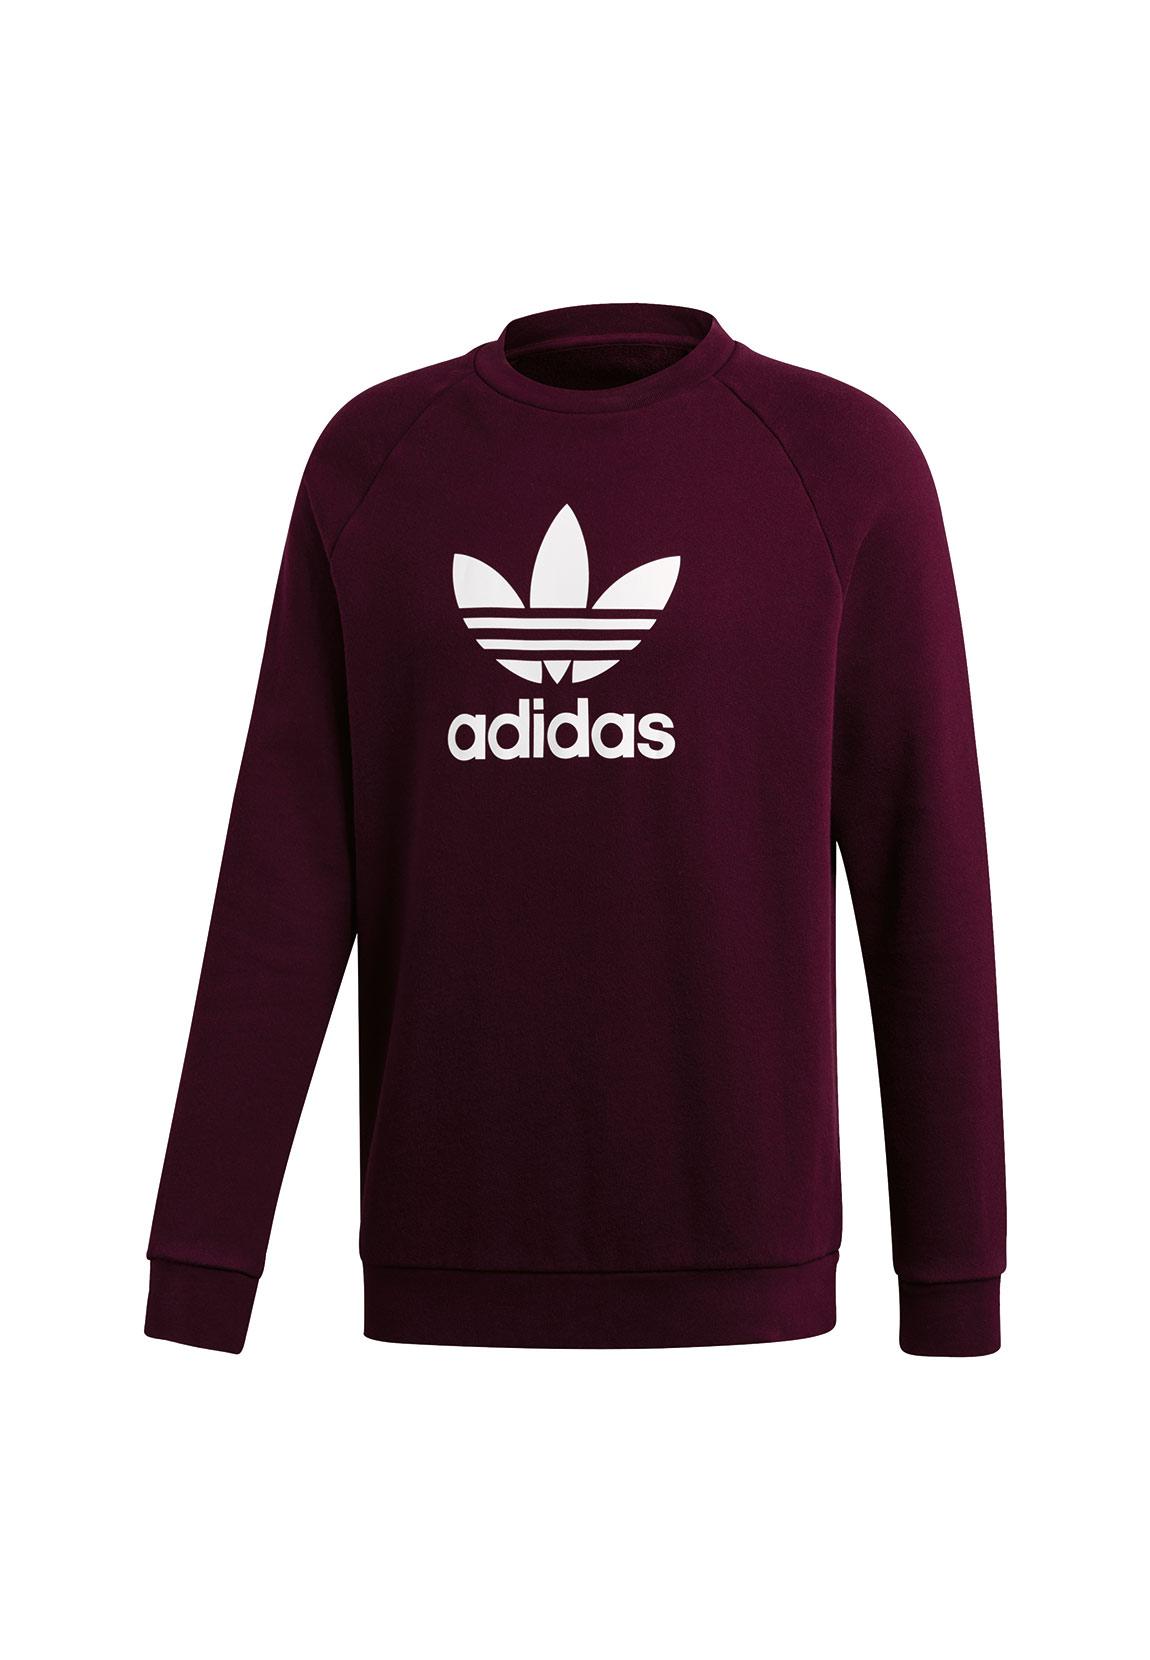 Details zu Adidas Originals Sweatshirt Herren TREFOIL CREW